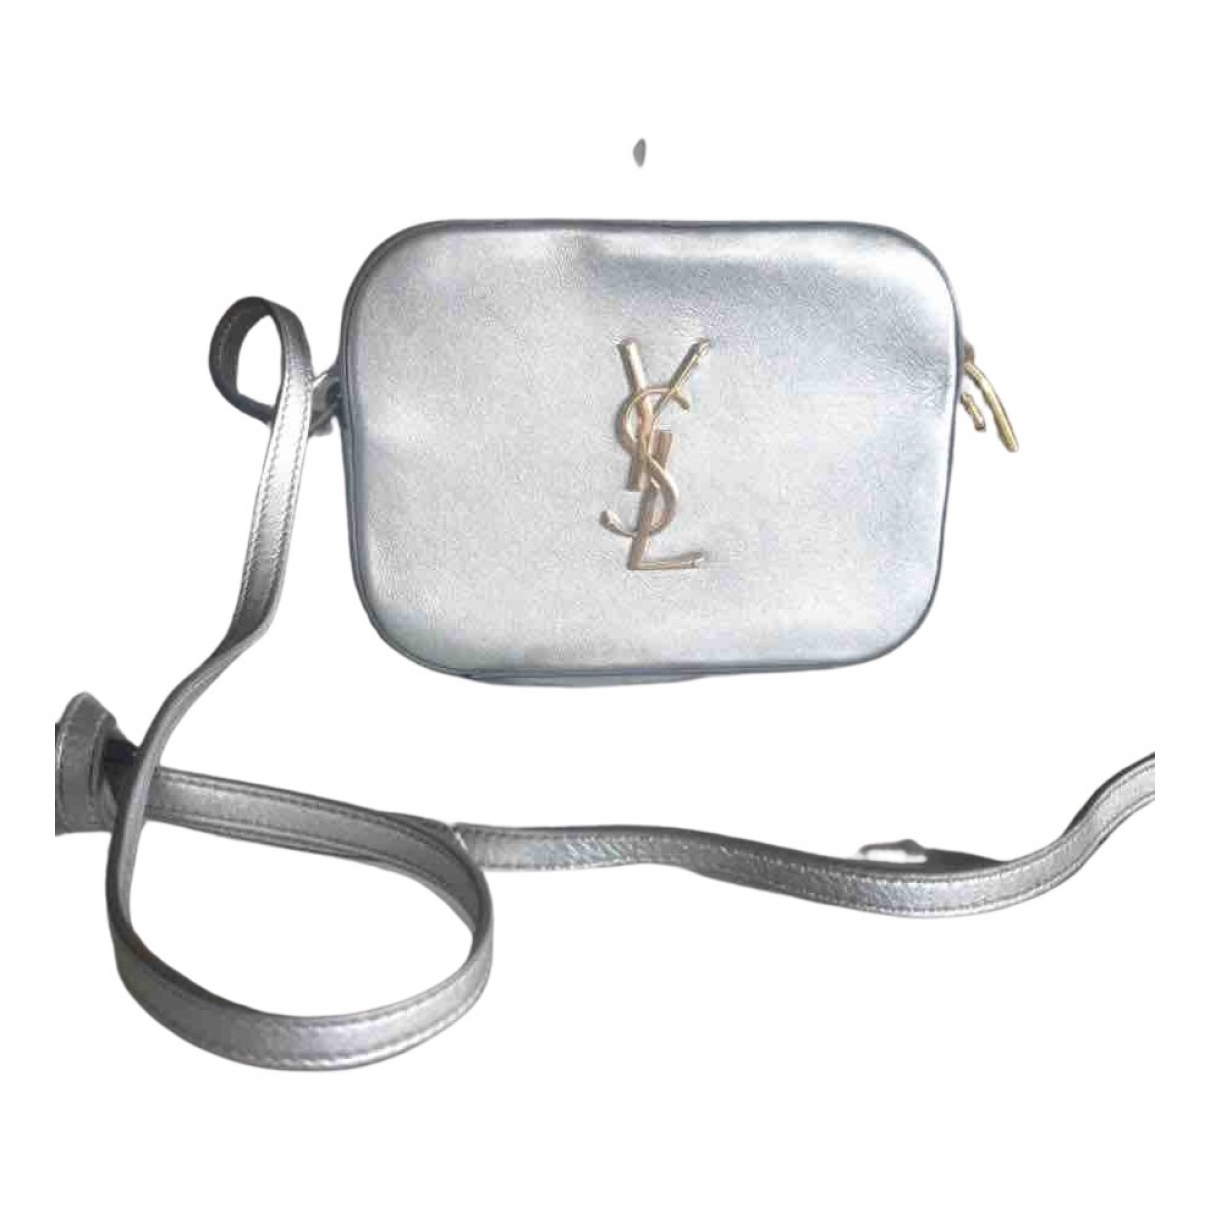 Saint Laurent Blogger Handtasche in  Silber Leder